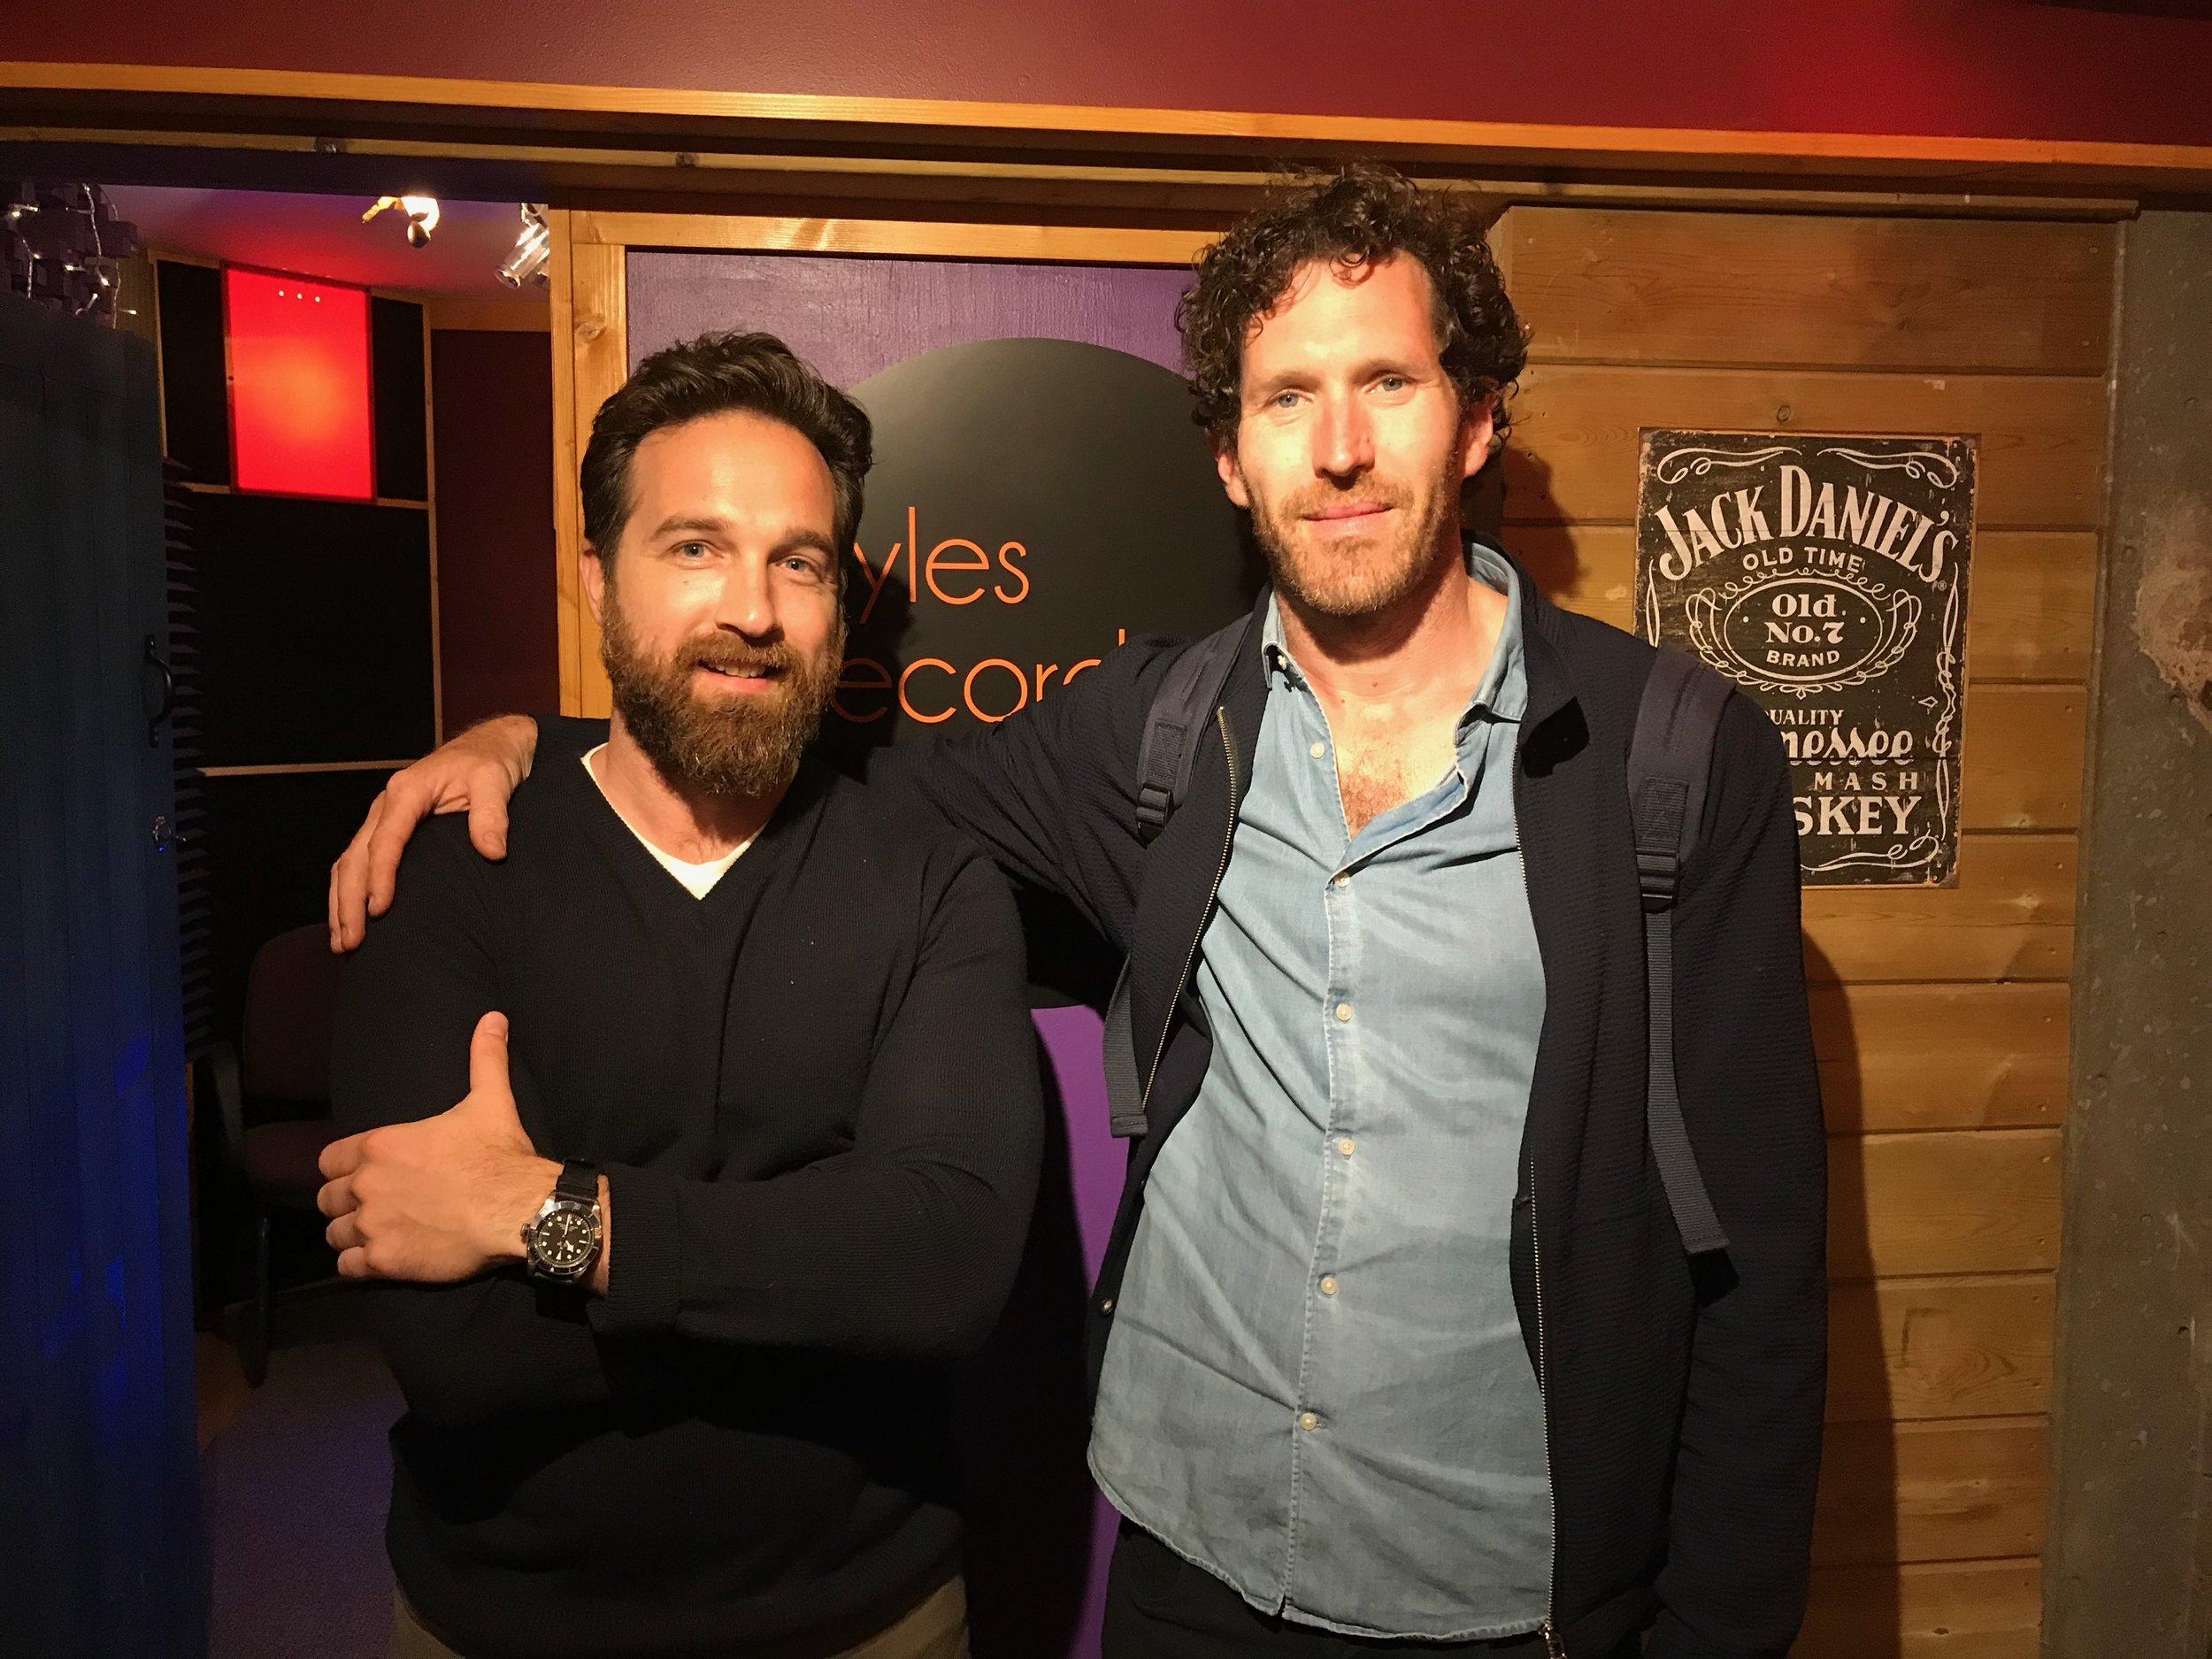 LA Film producer Kyle Roper and creative photographer Brendan Barry after a film documenty narration studio session..